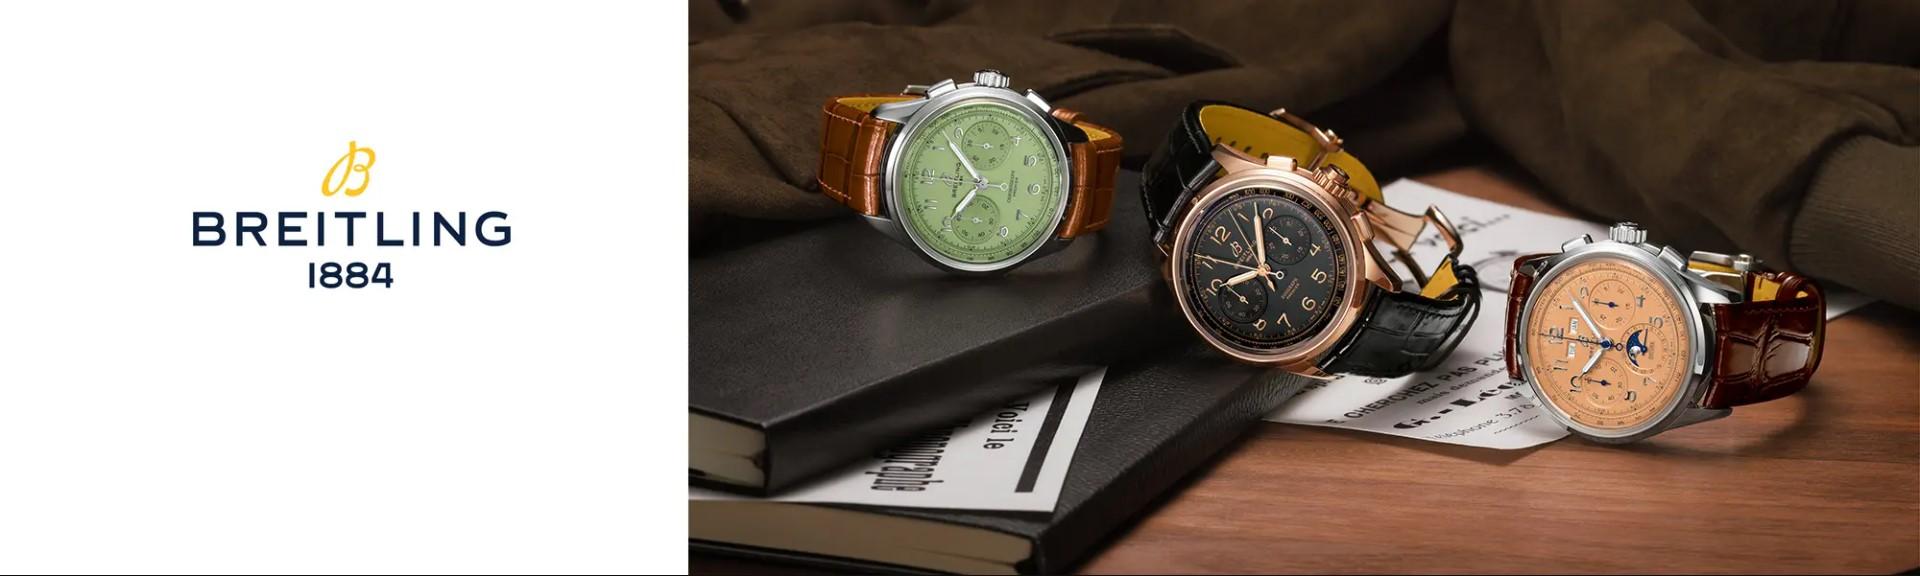 Breitling miesten kello